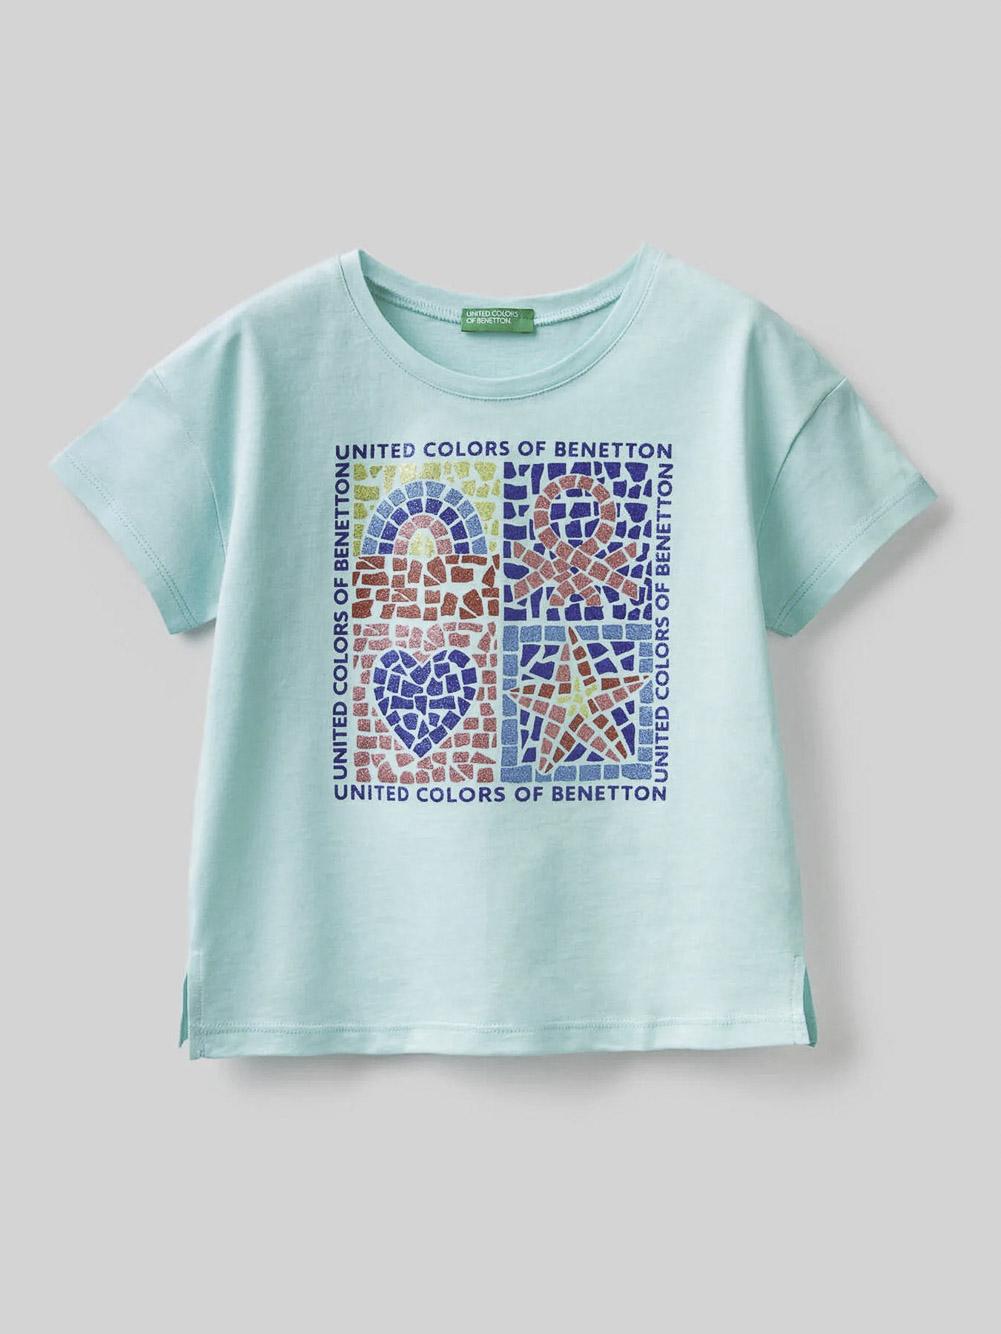 012 BENETTON Μπλούζα t-shirt 3096C15A9 21P27Q